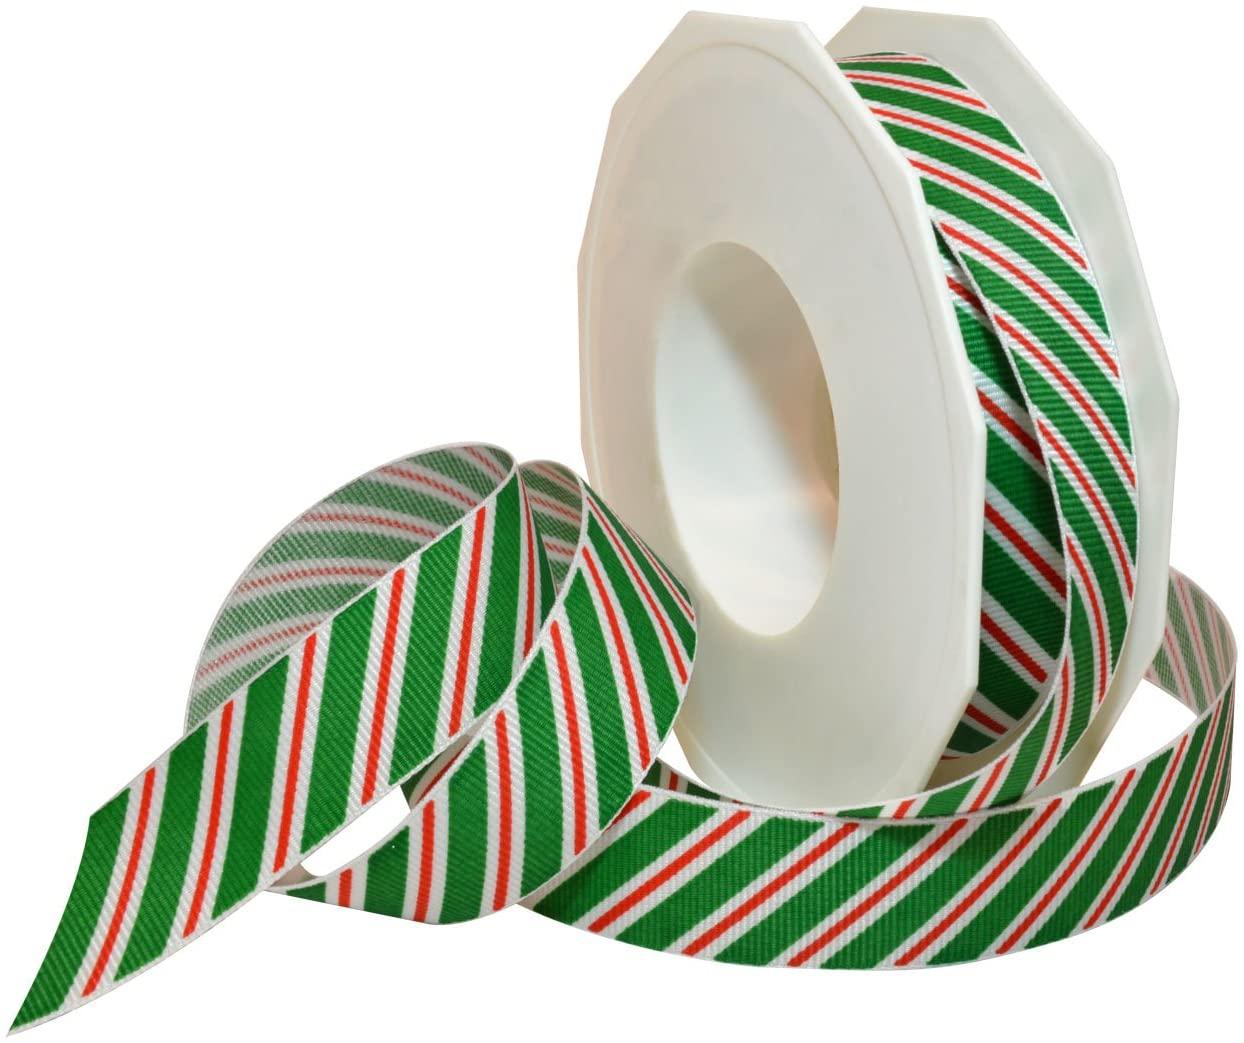 Morex Ribbon 80605/20-607 Candy Cane Stripes Grosgrain Ribbon, 7/8-Inch by 20-Yard, Emerald